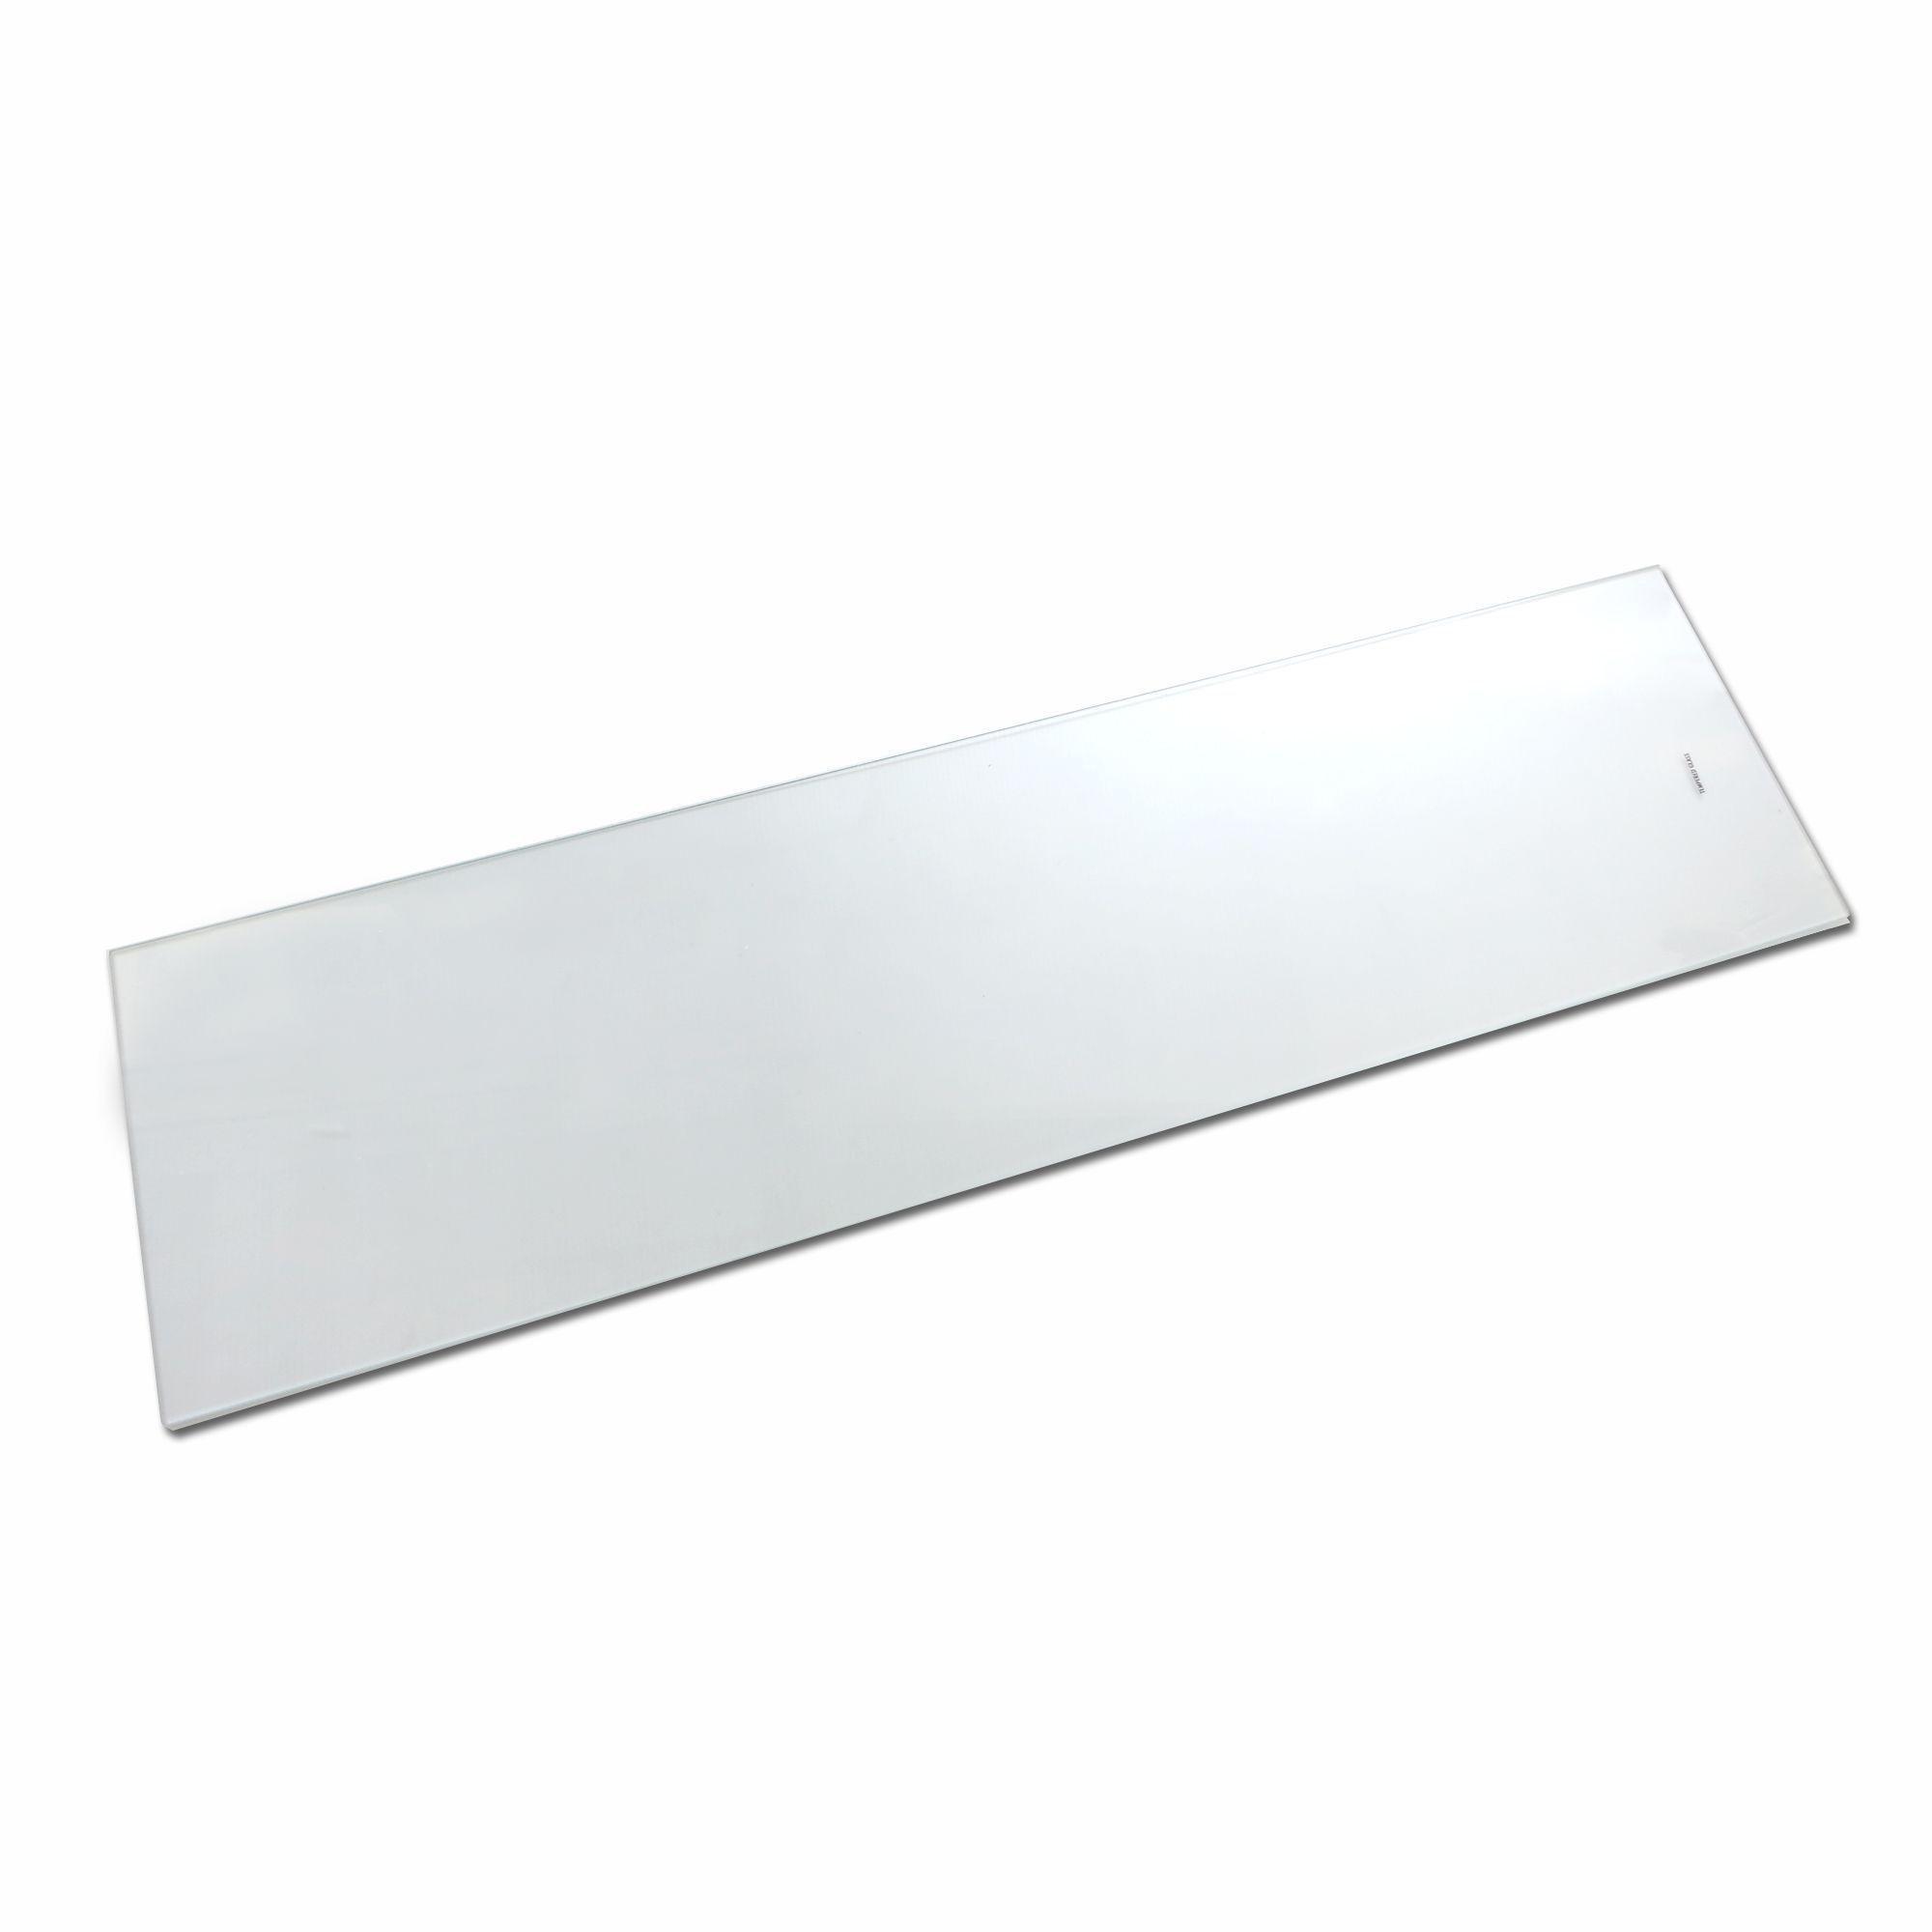 Clear Internal Glass Kitchen Cabinet Shelves (l)958mm (d)247mm, Pack Of 2